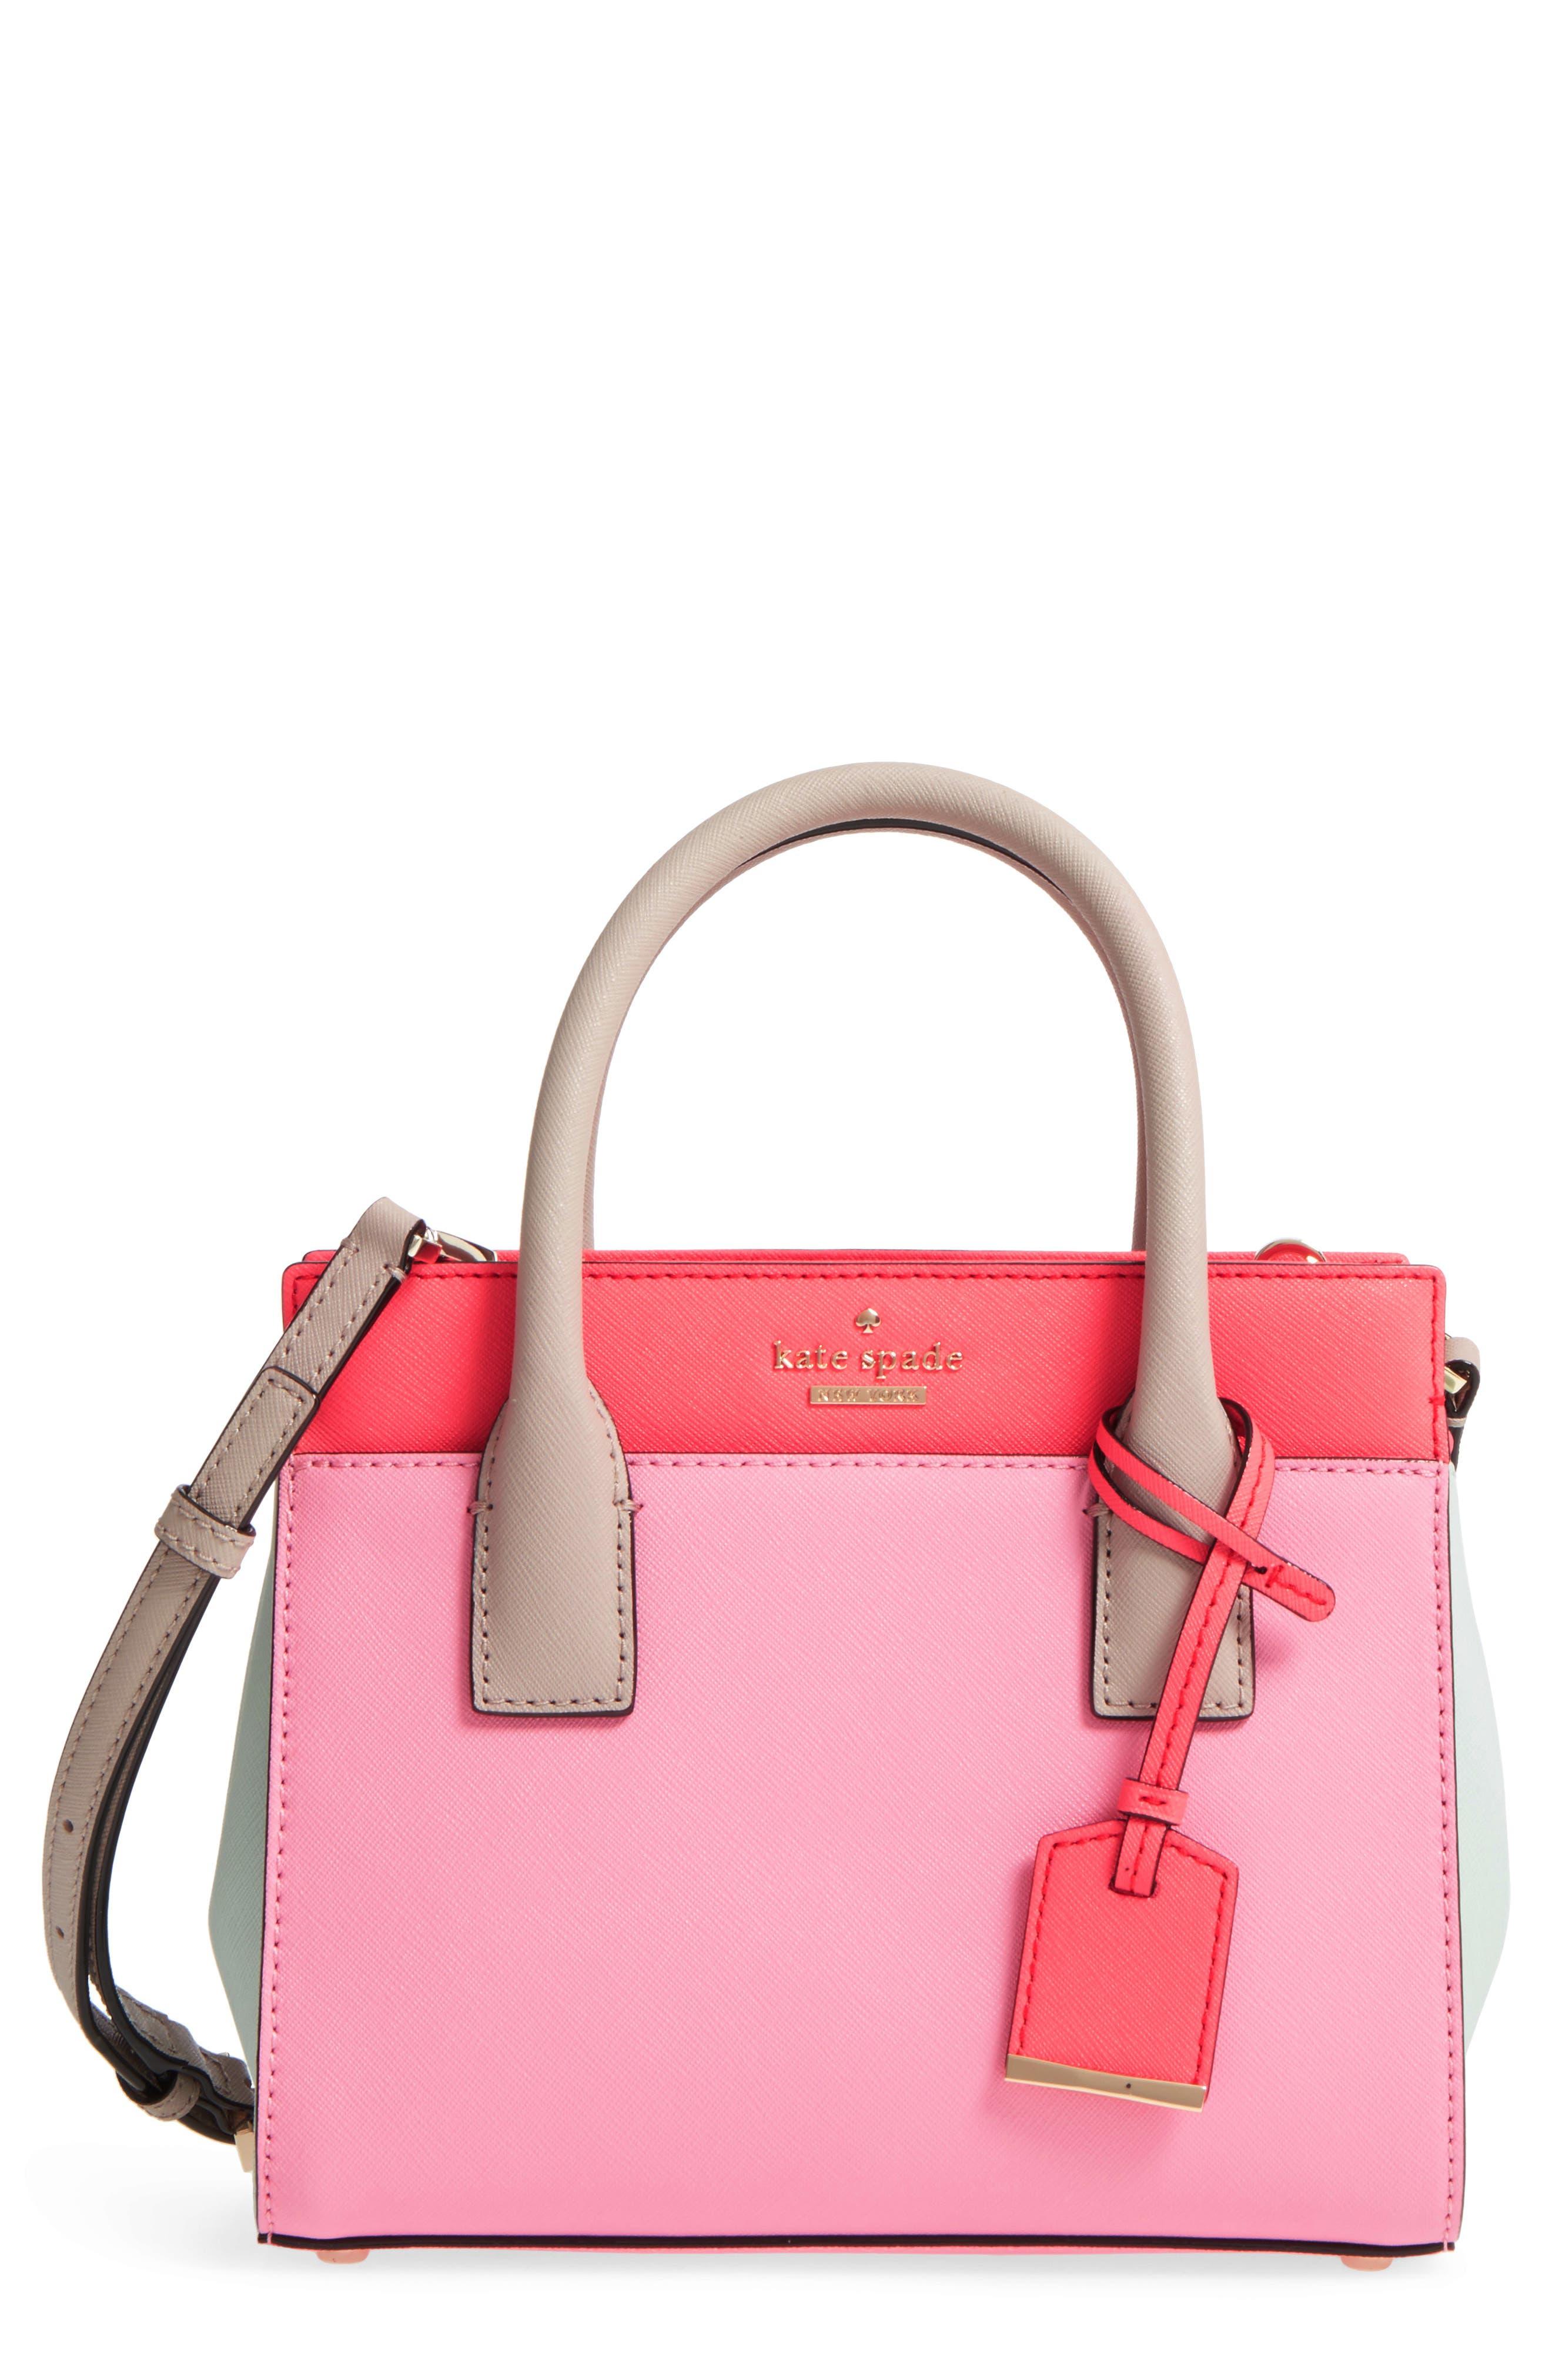 'cameron street - mini candace' leather satchel,                             Main thumbnail 1, color,                             690